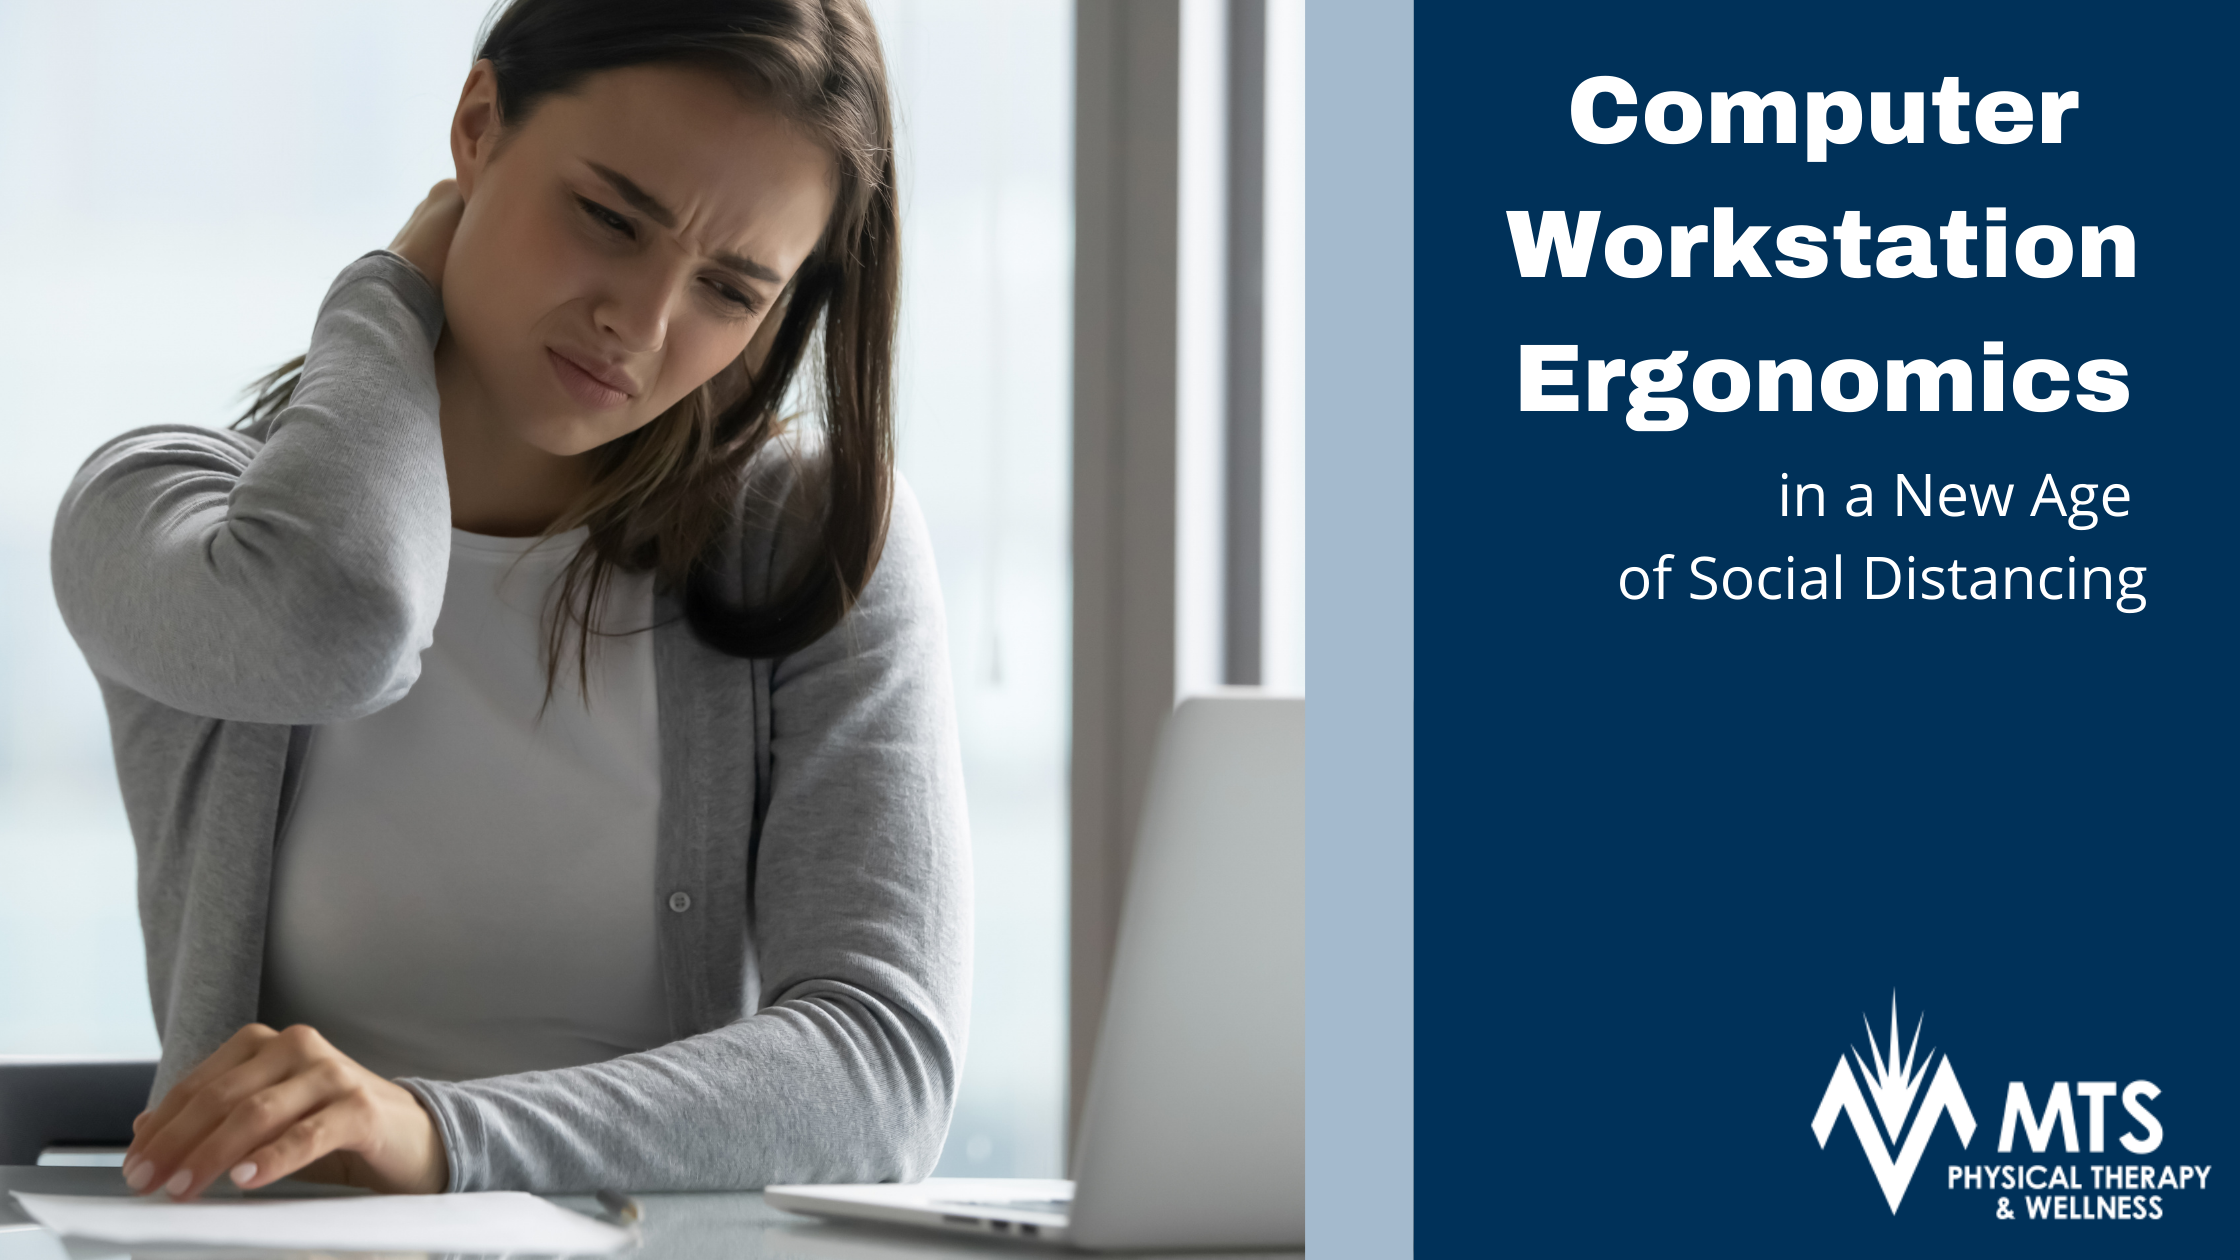 Importance of Computer Workstation Ergonomics